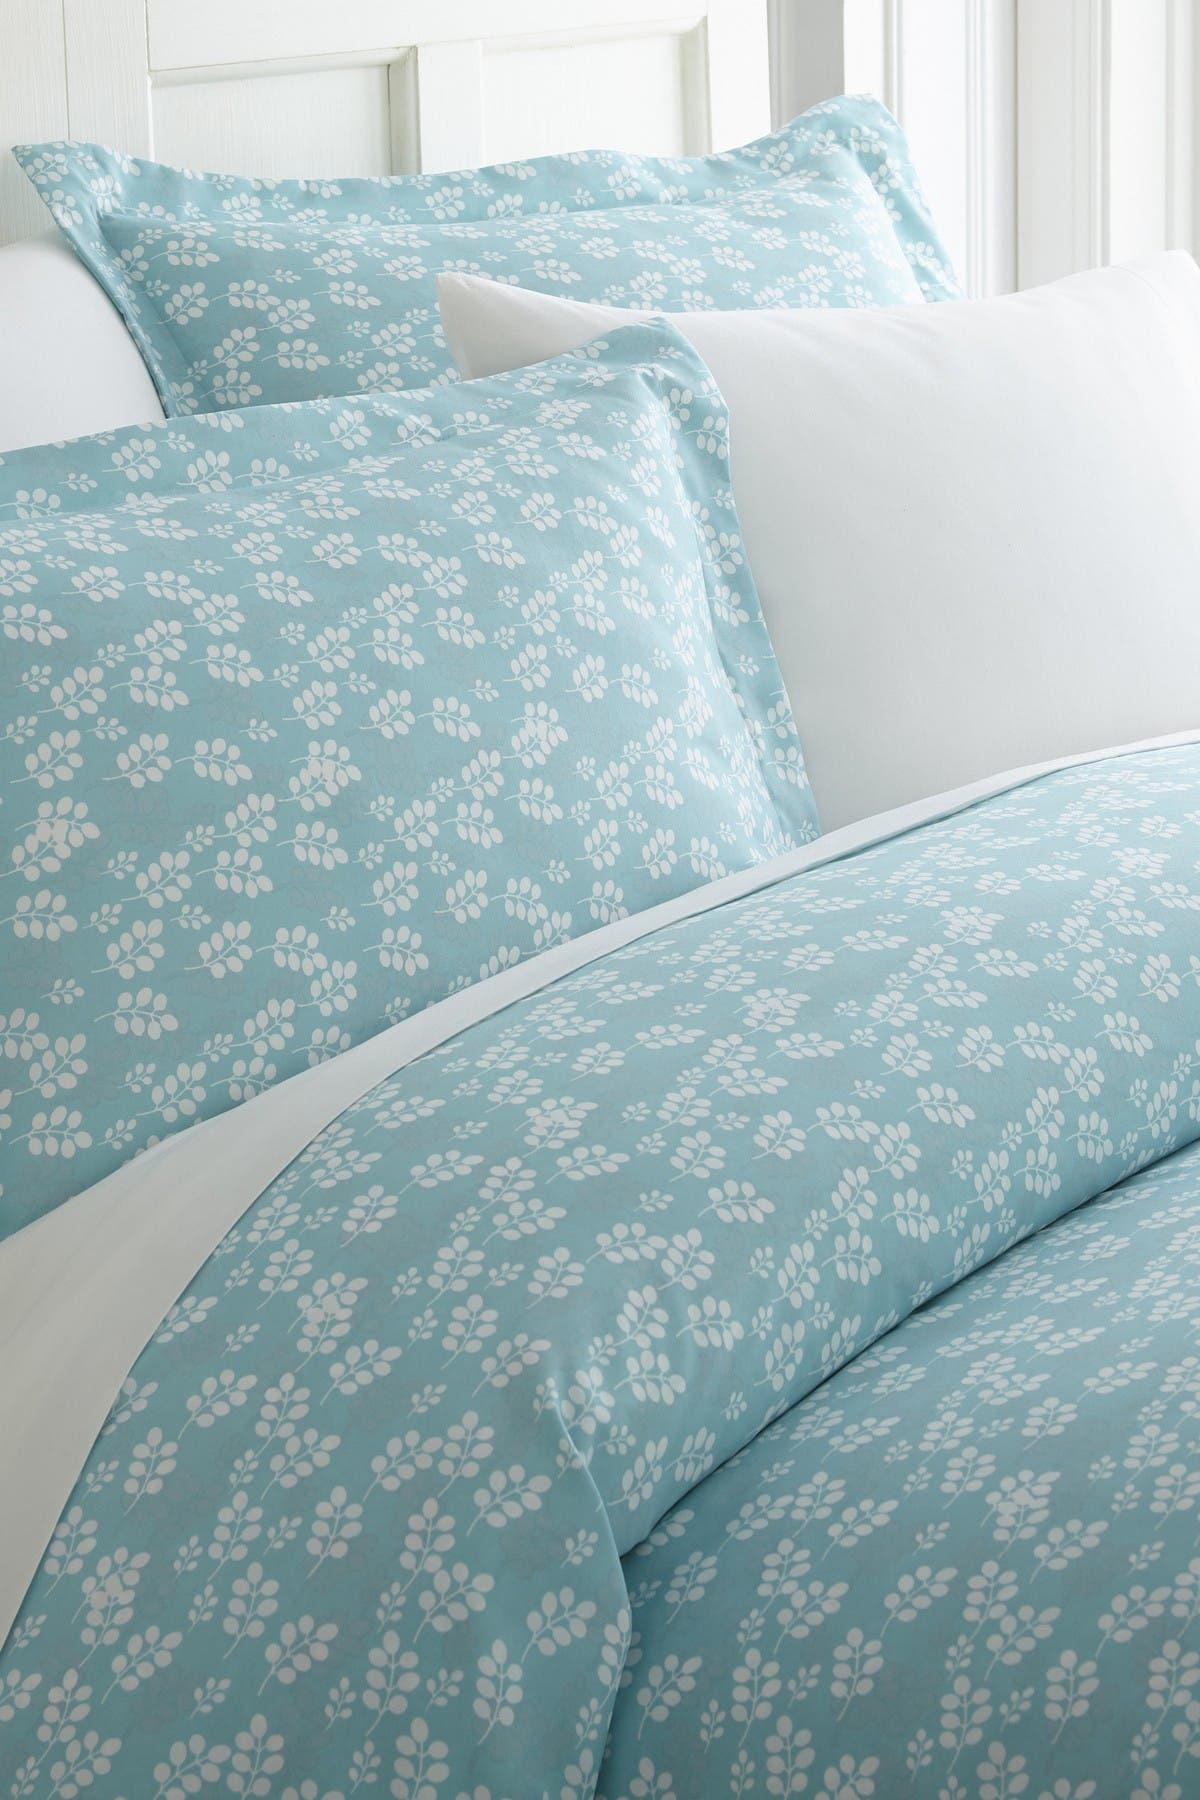 Image of IENJOY HOME Home Spun Premium Ultra Soft Wheatfield Pattern 3-Piece Duvet Cover Full/Queen Set - Pale